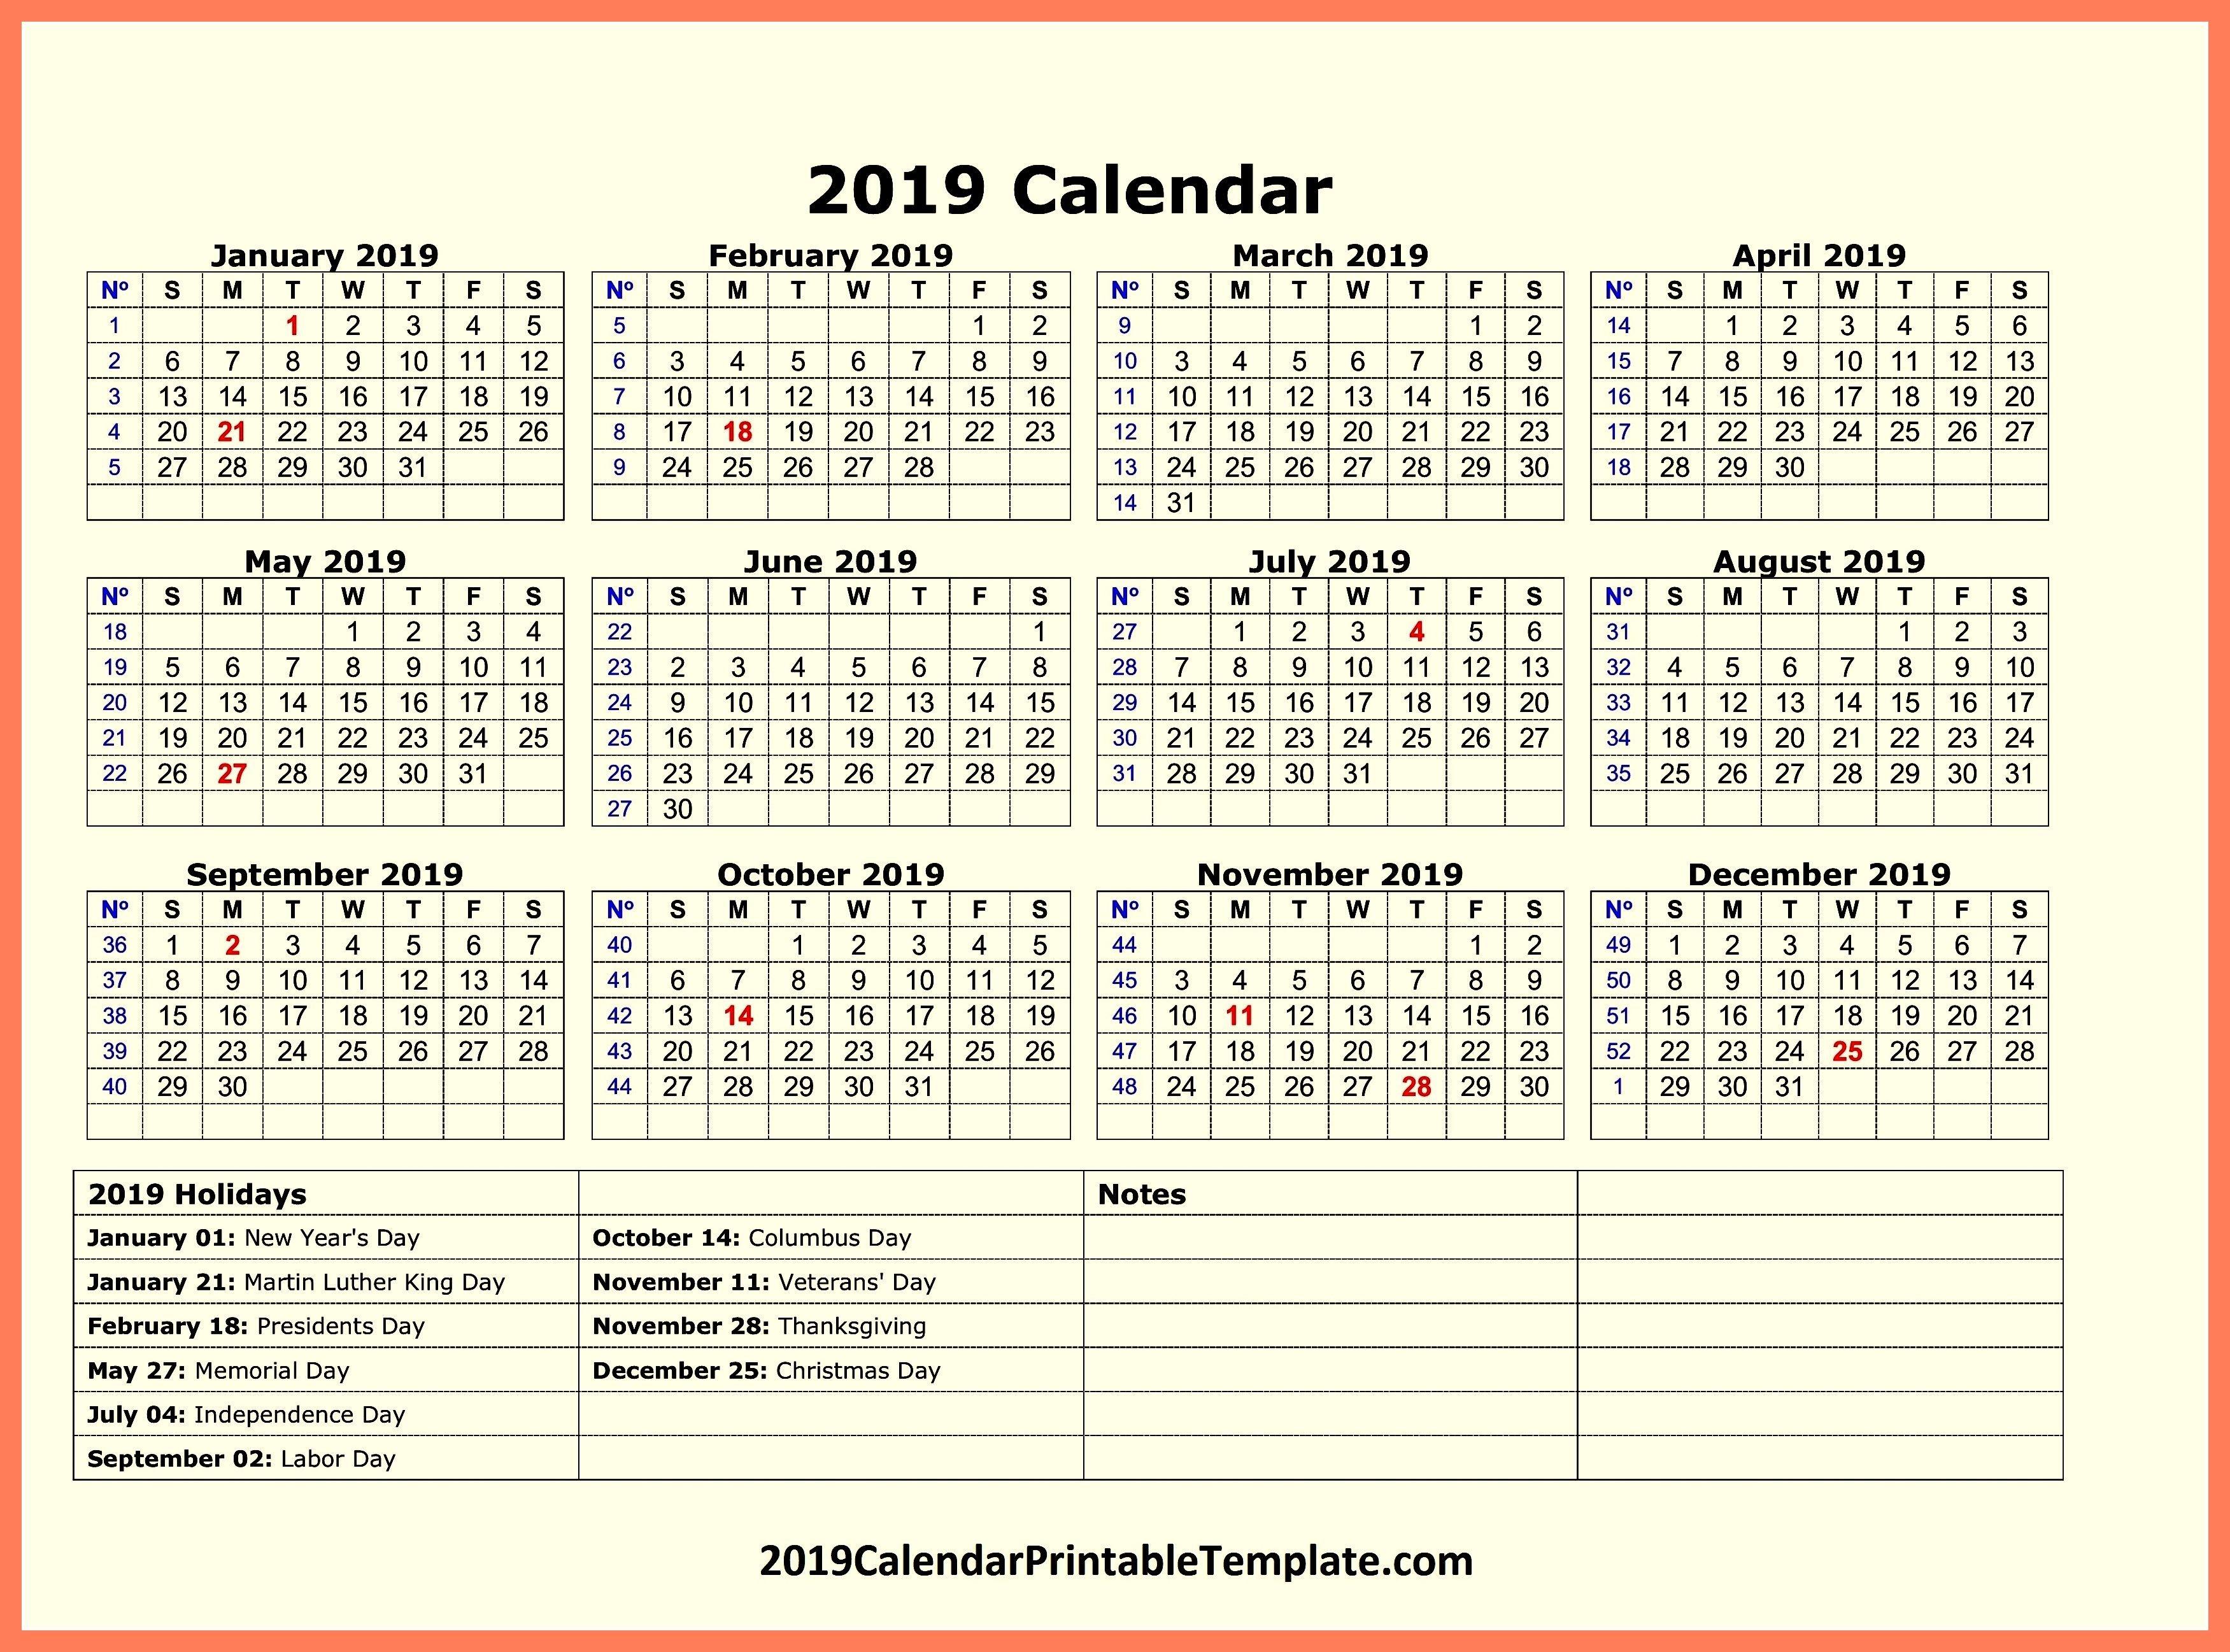 Pin2019Calendarprintabletemplate On 2019 Calendar Holidays In Calendar 2019 Government Holidays